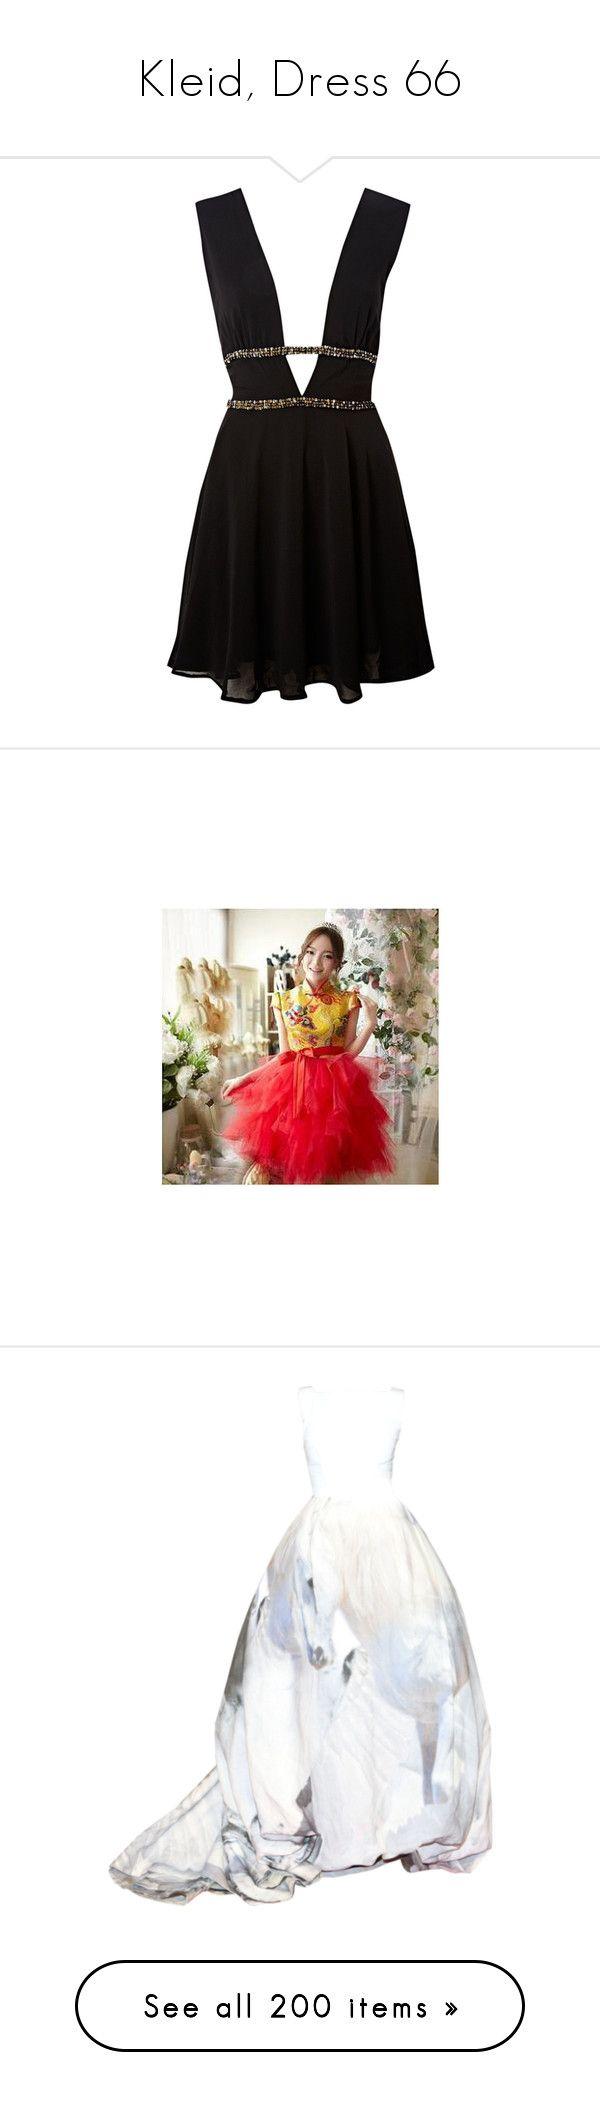 """Kleid, Dress 66"" by kristinaeduardovna ❤ liked on Polyvore featuring dresses, vestidos, short dresses, black dress, black, women, v neck short dress, john zack dresses, v neck dress and zipper mini dress"